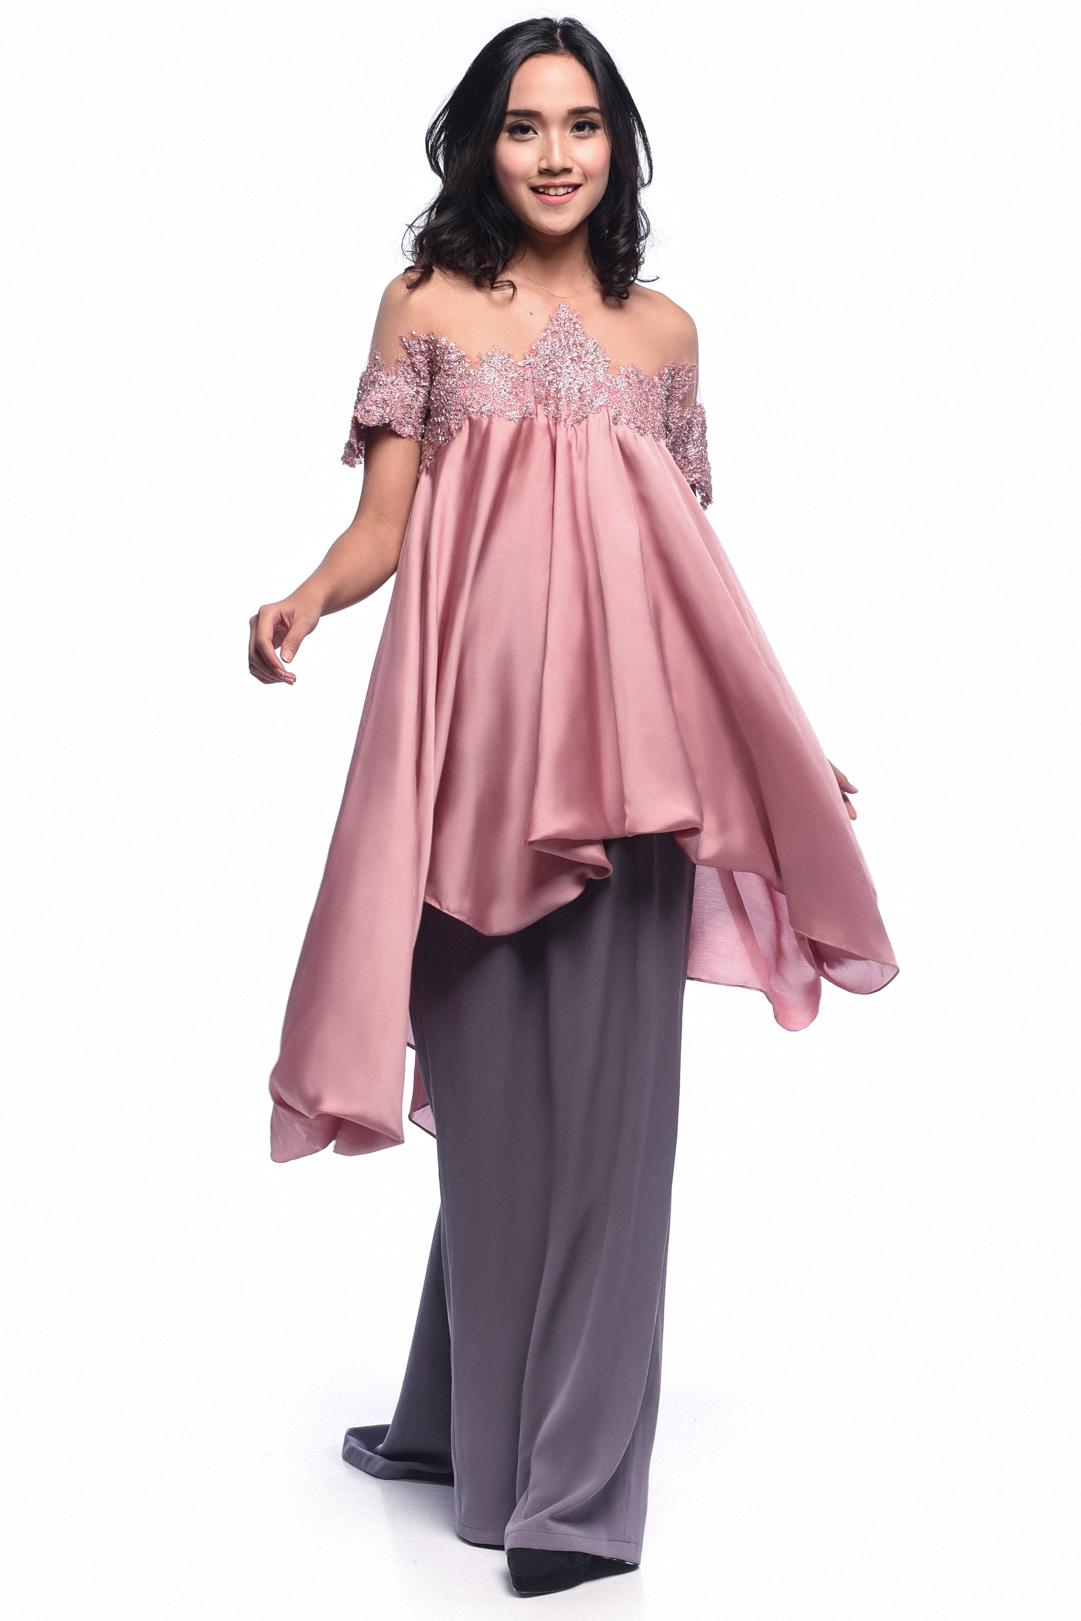 Chic Salem Pink